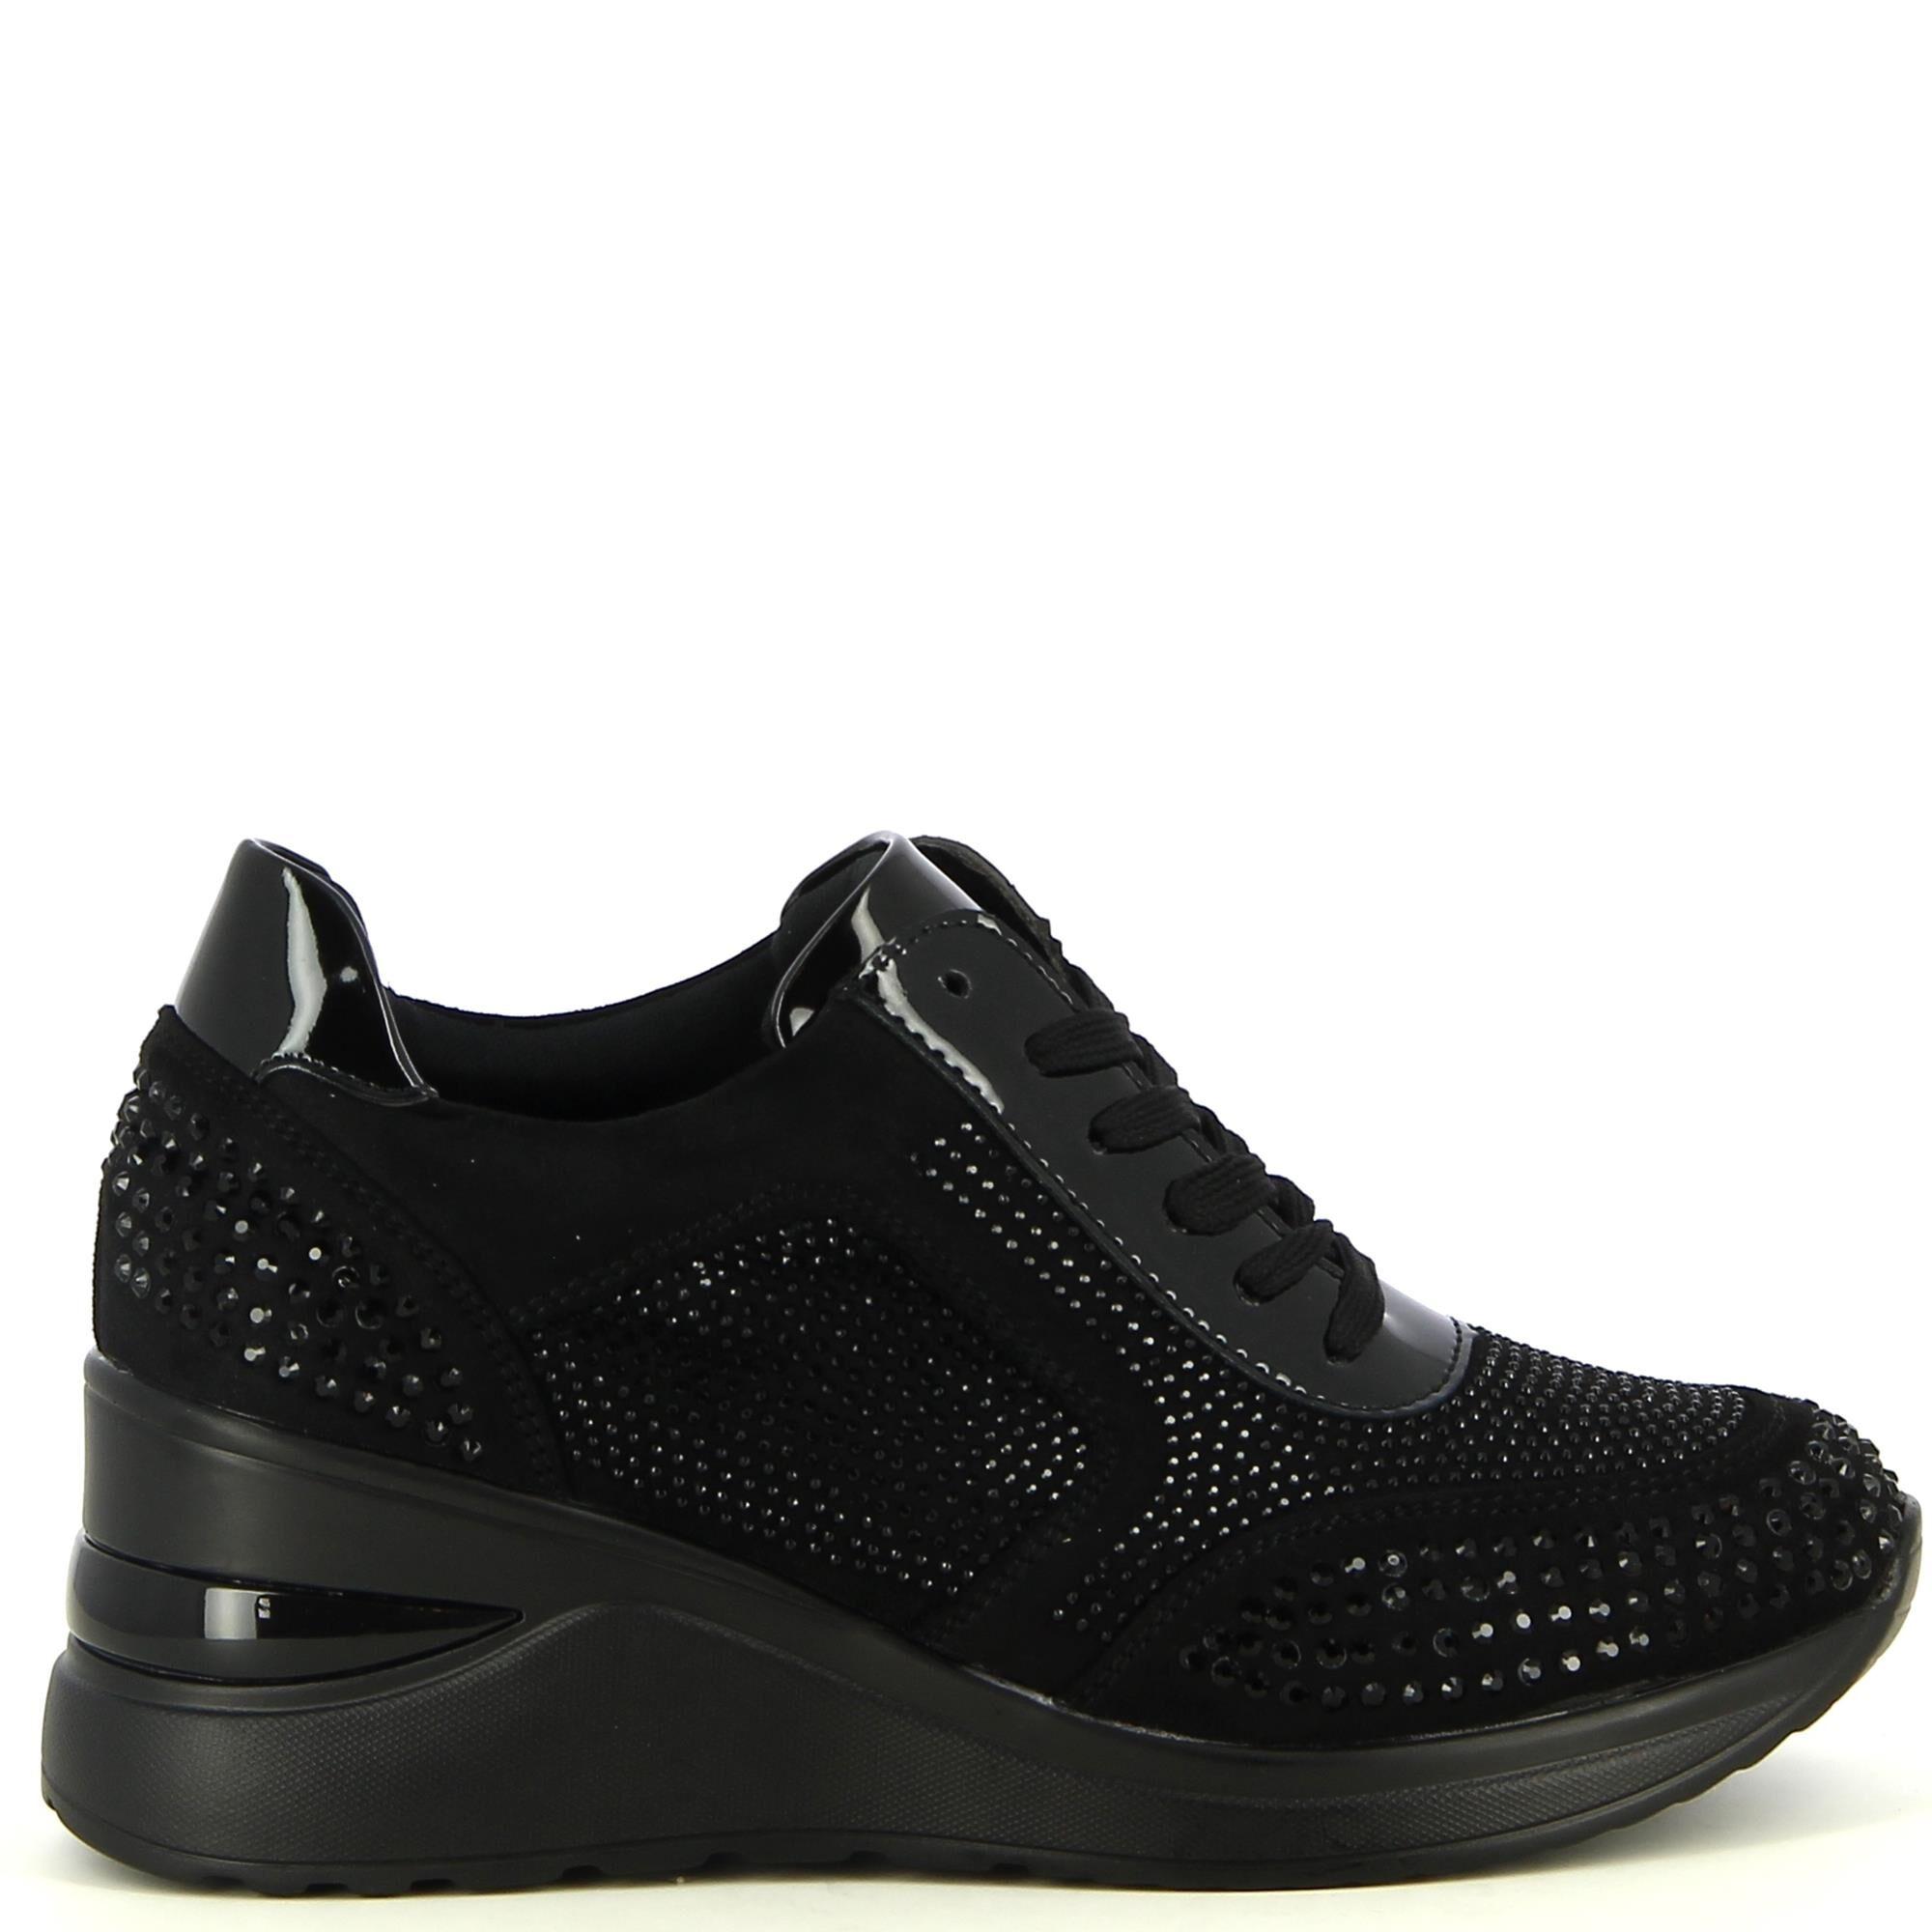 Ken Shoe Fahion - Noir - Baskets